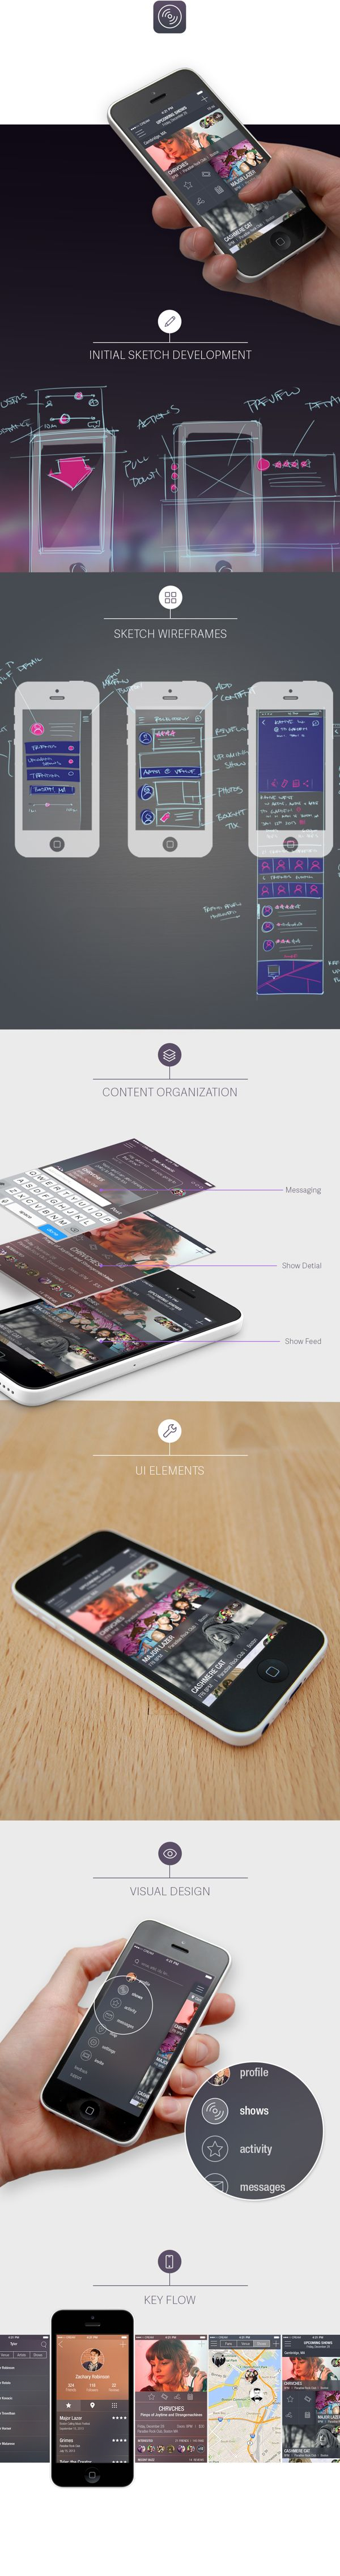 RockLobby Mobile App Redesign by Zach Robinson, via Behance